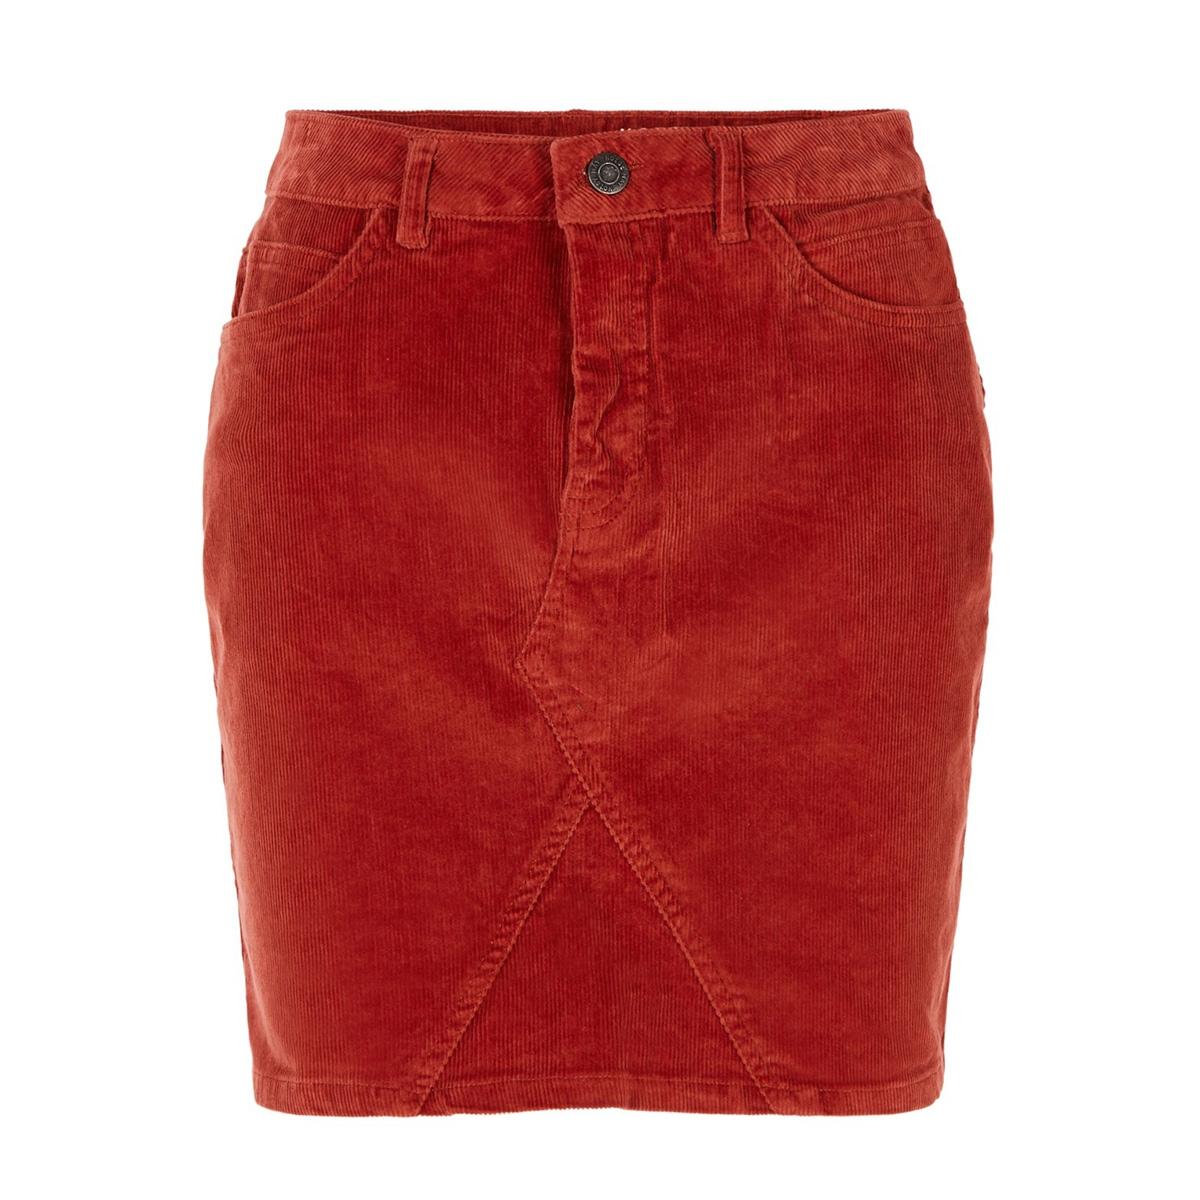 nmayla nw corduroy skirt clr 27009977 noisy may rok tandori spice